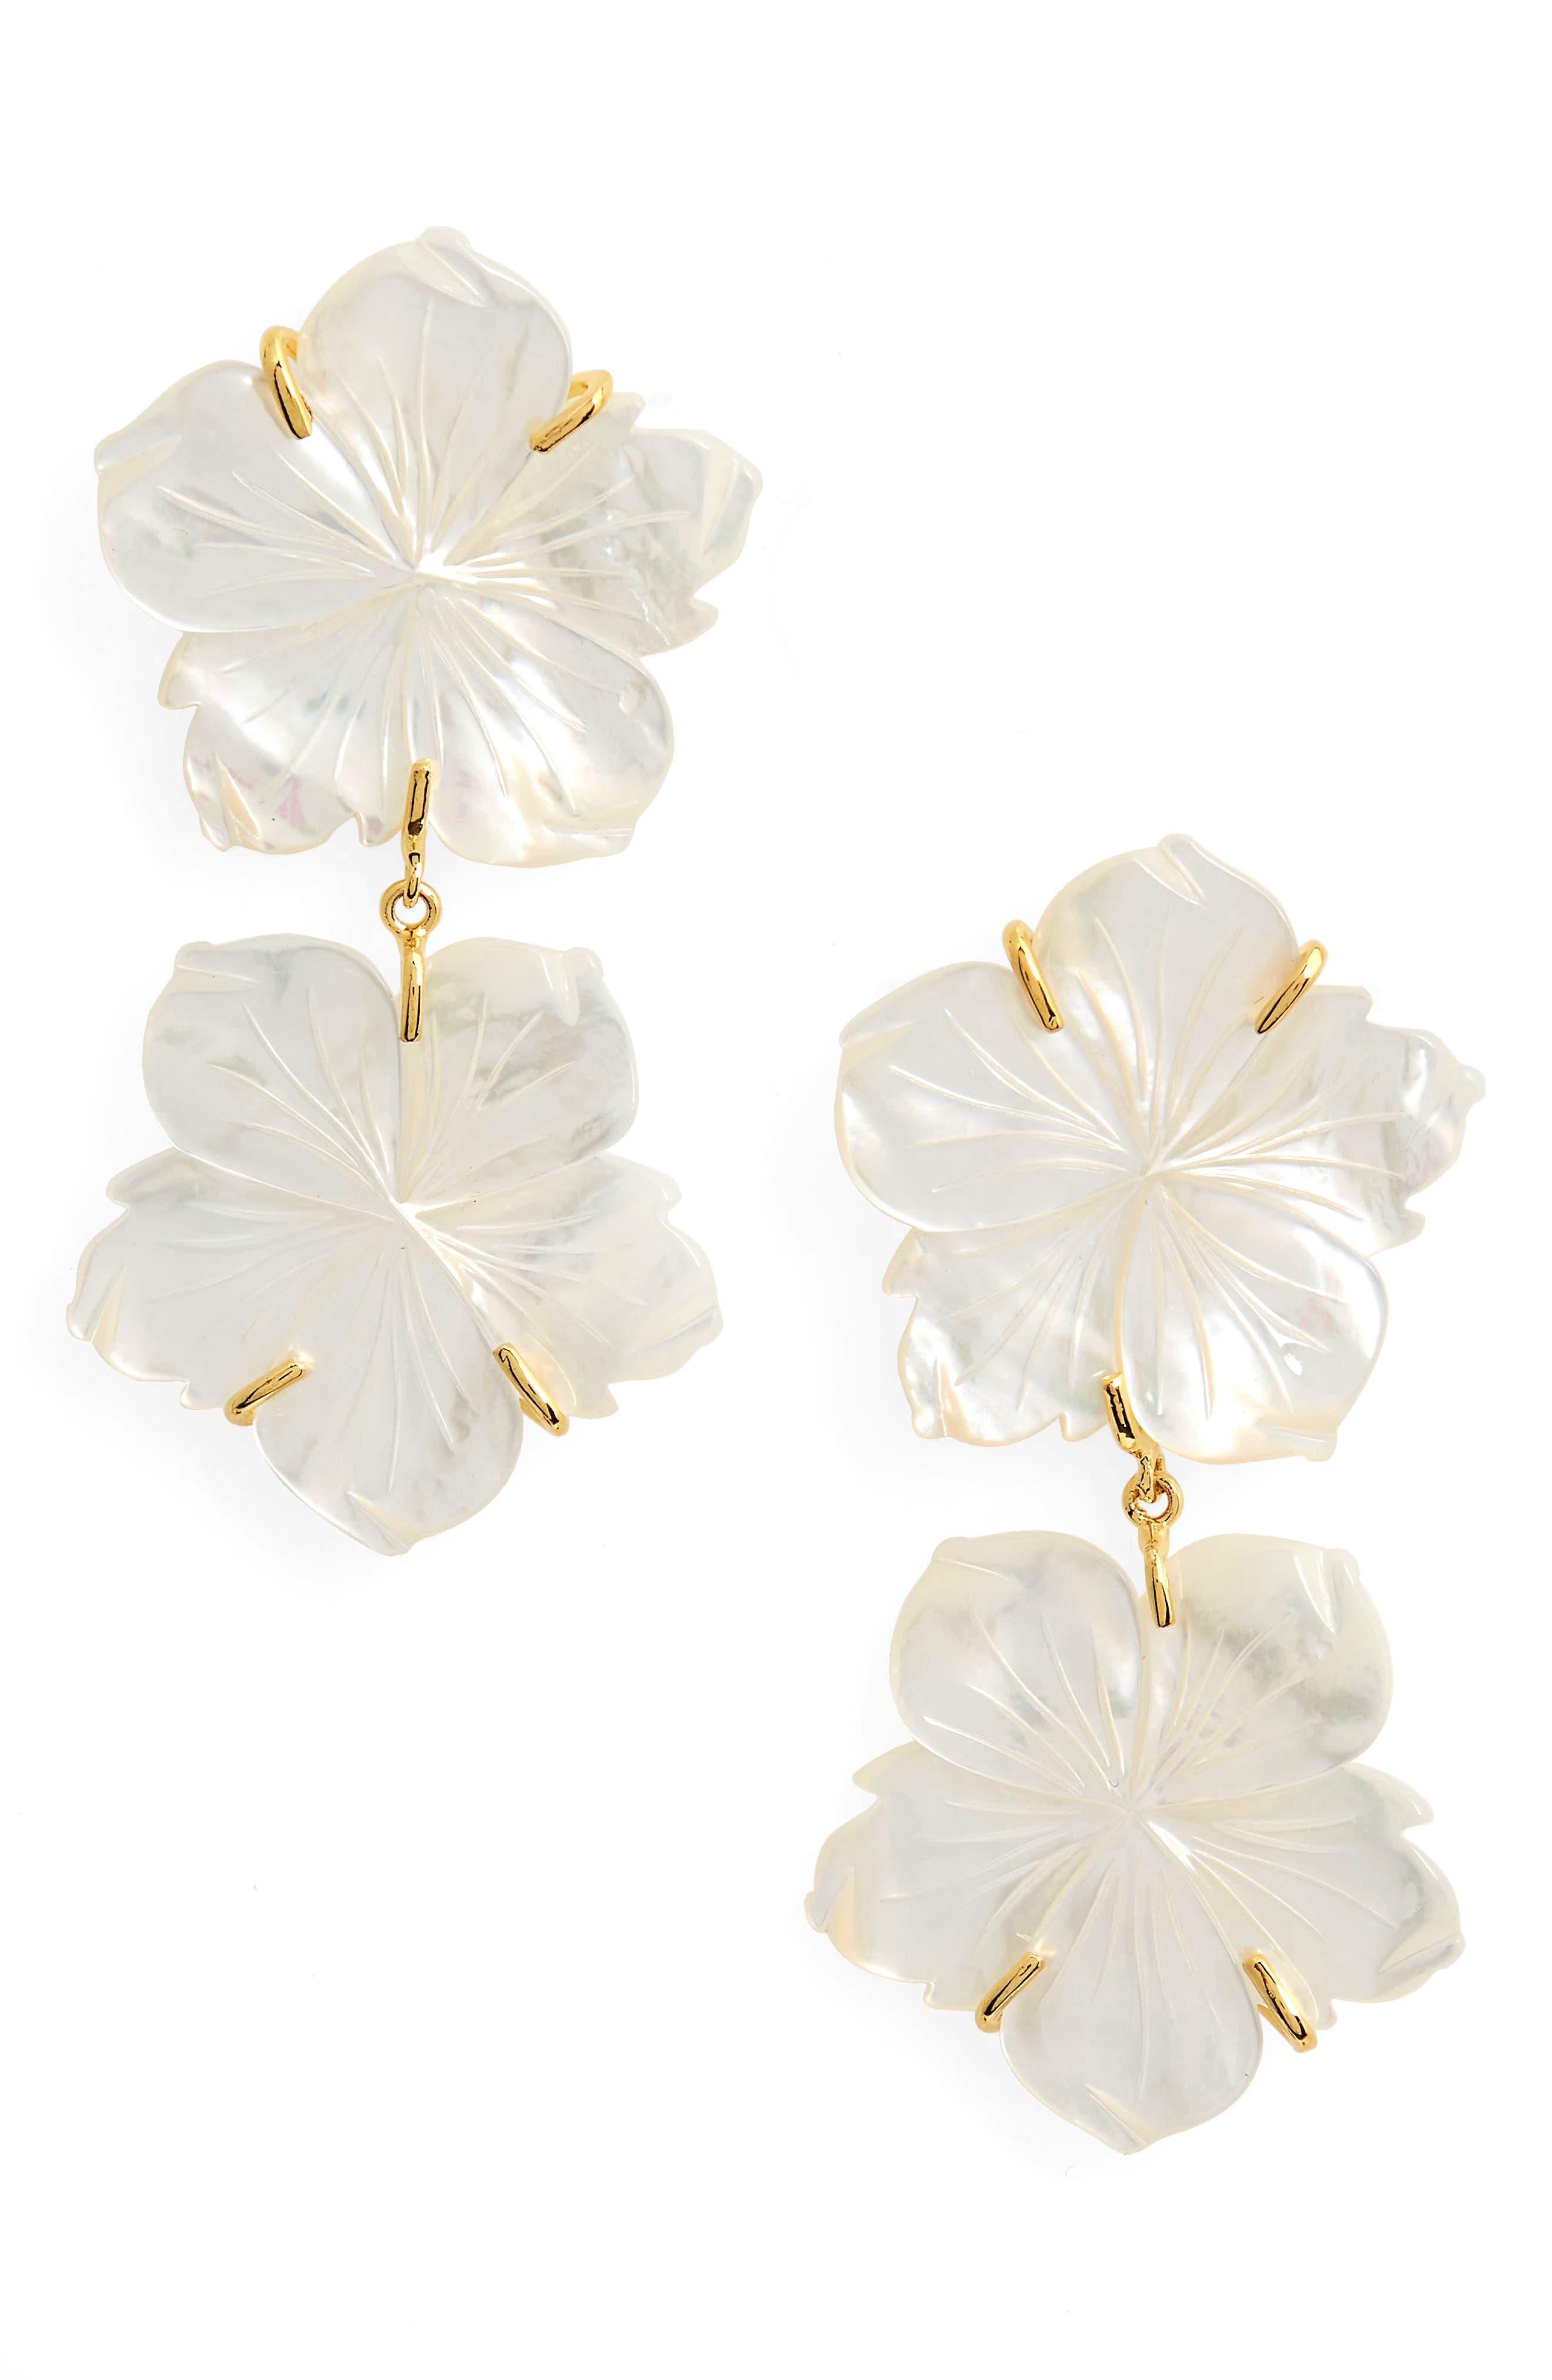 Paperwhite Drop Earrings,                         Main,                         color, Multi